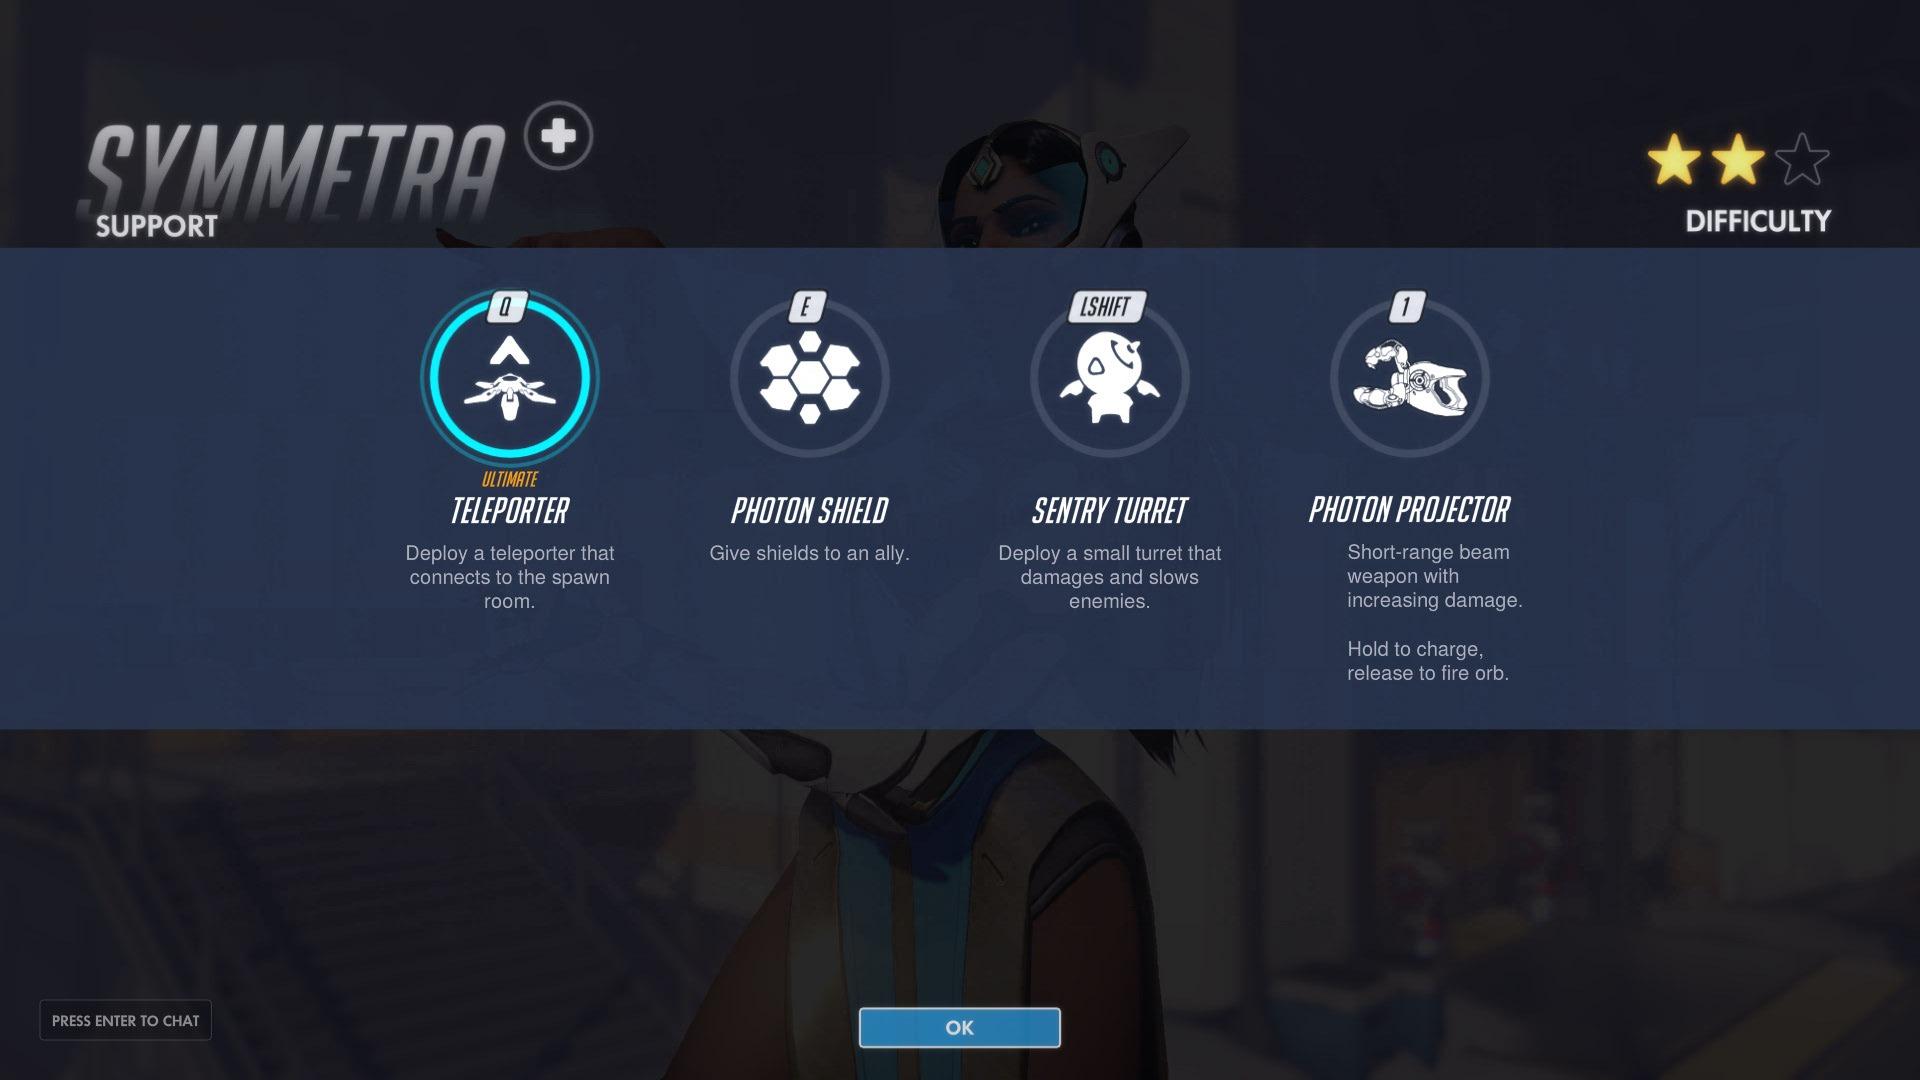 Symmetra Support Abilities Overwatch